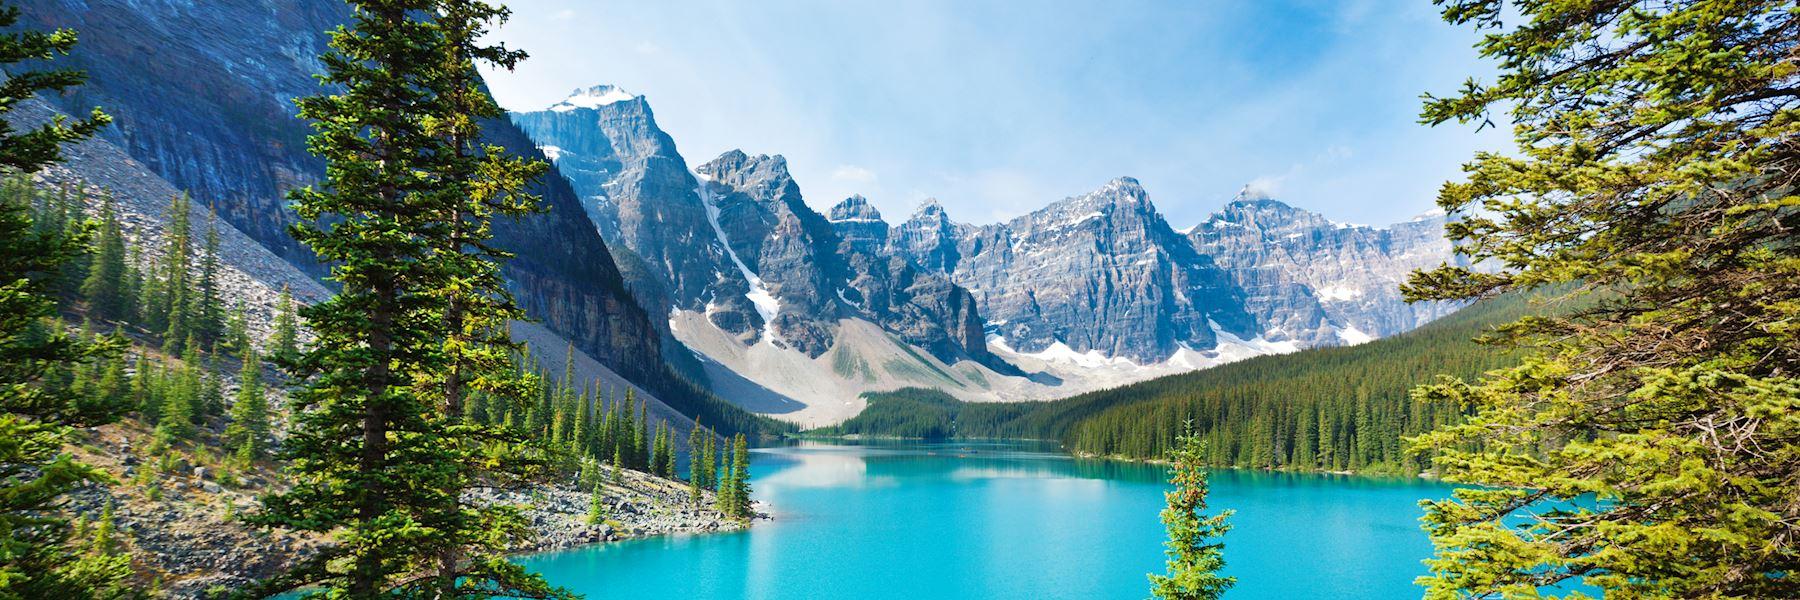 Visit Banff, Canada